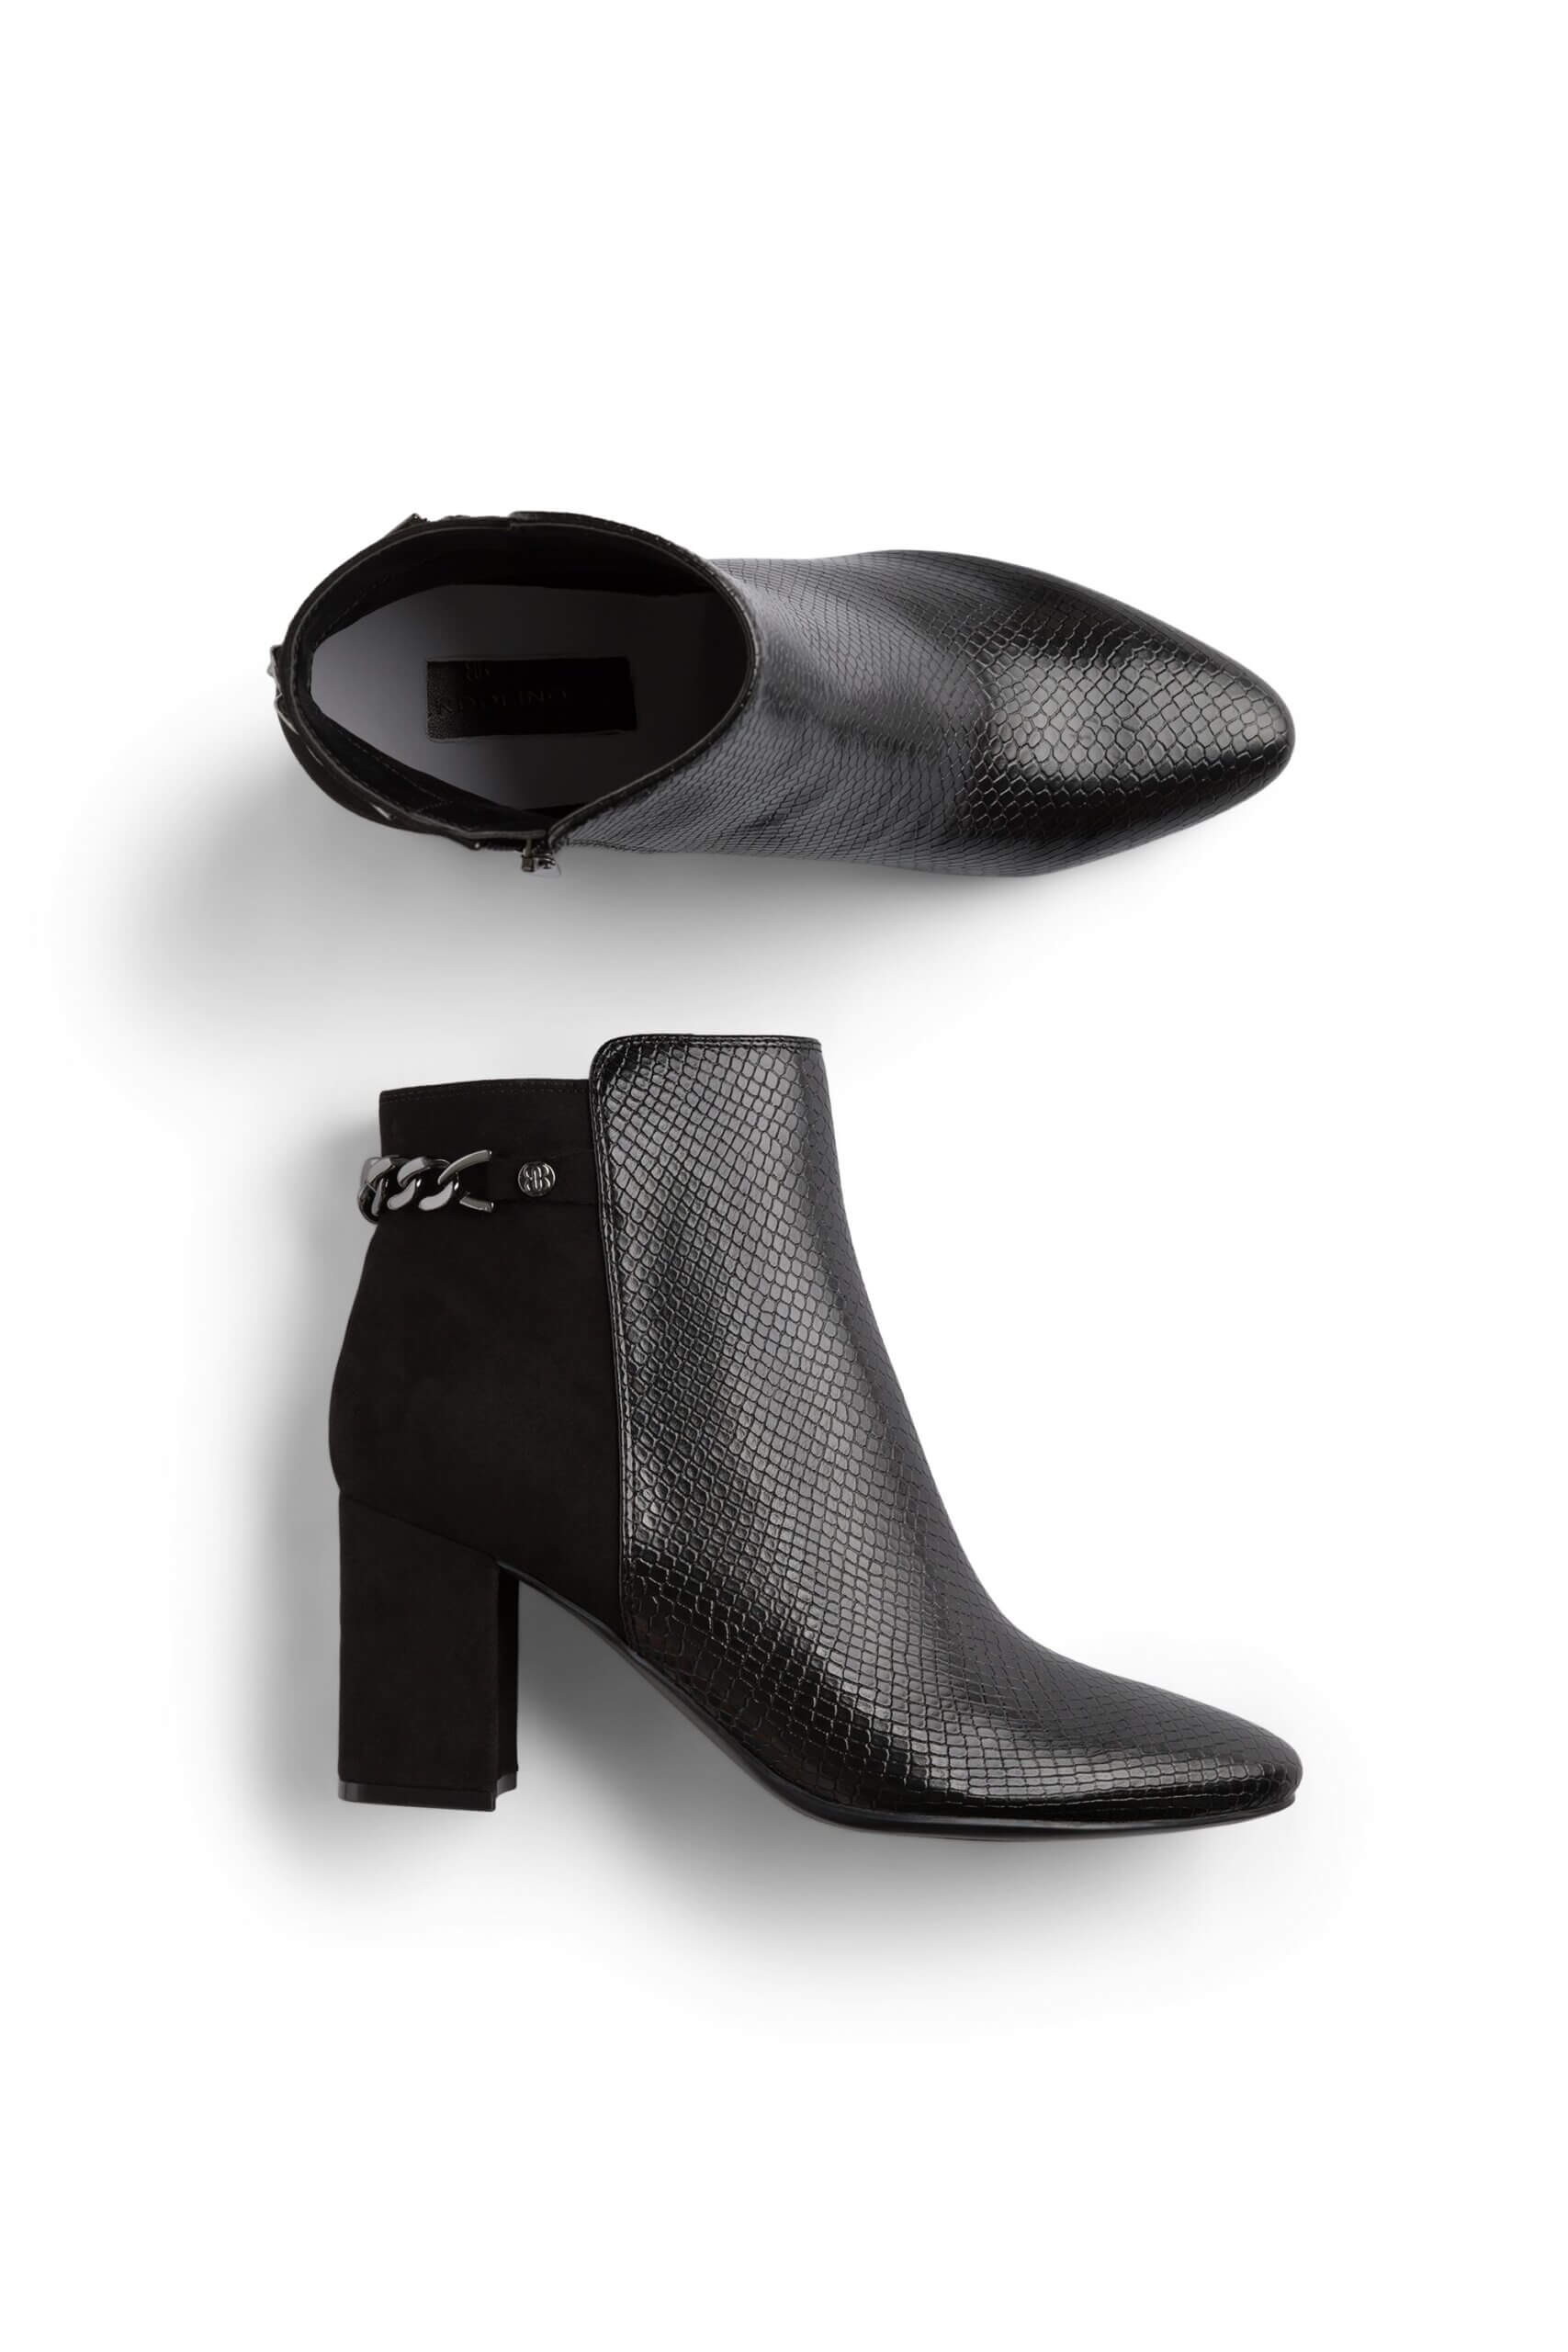 Stitch Fix Women's black block-heeled booties.